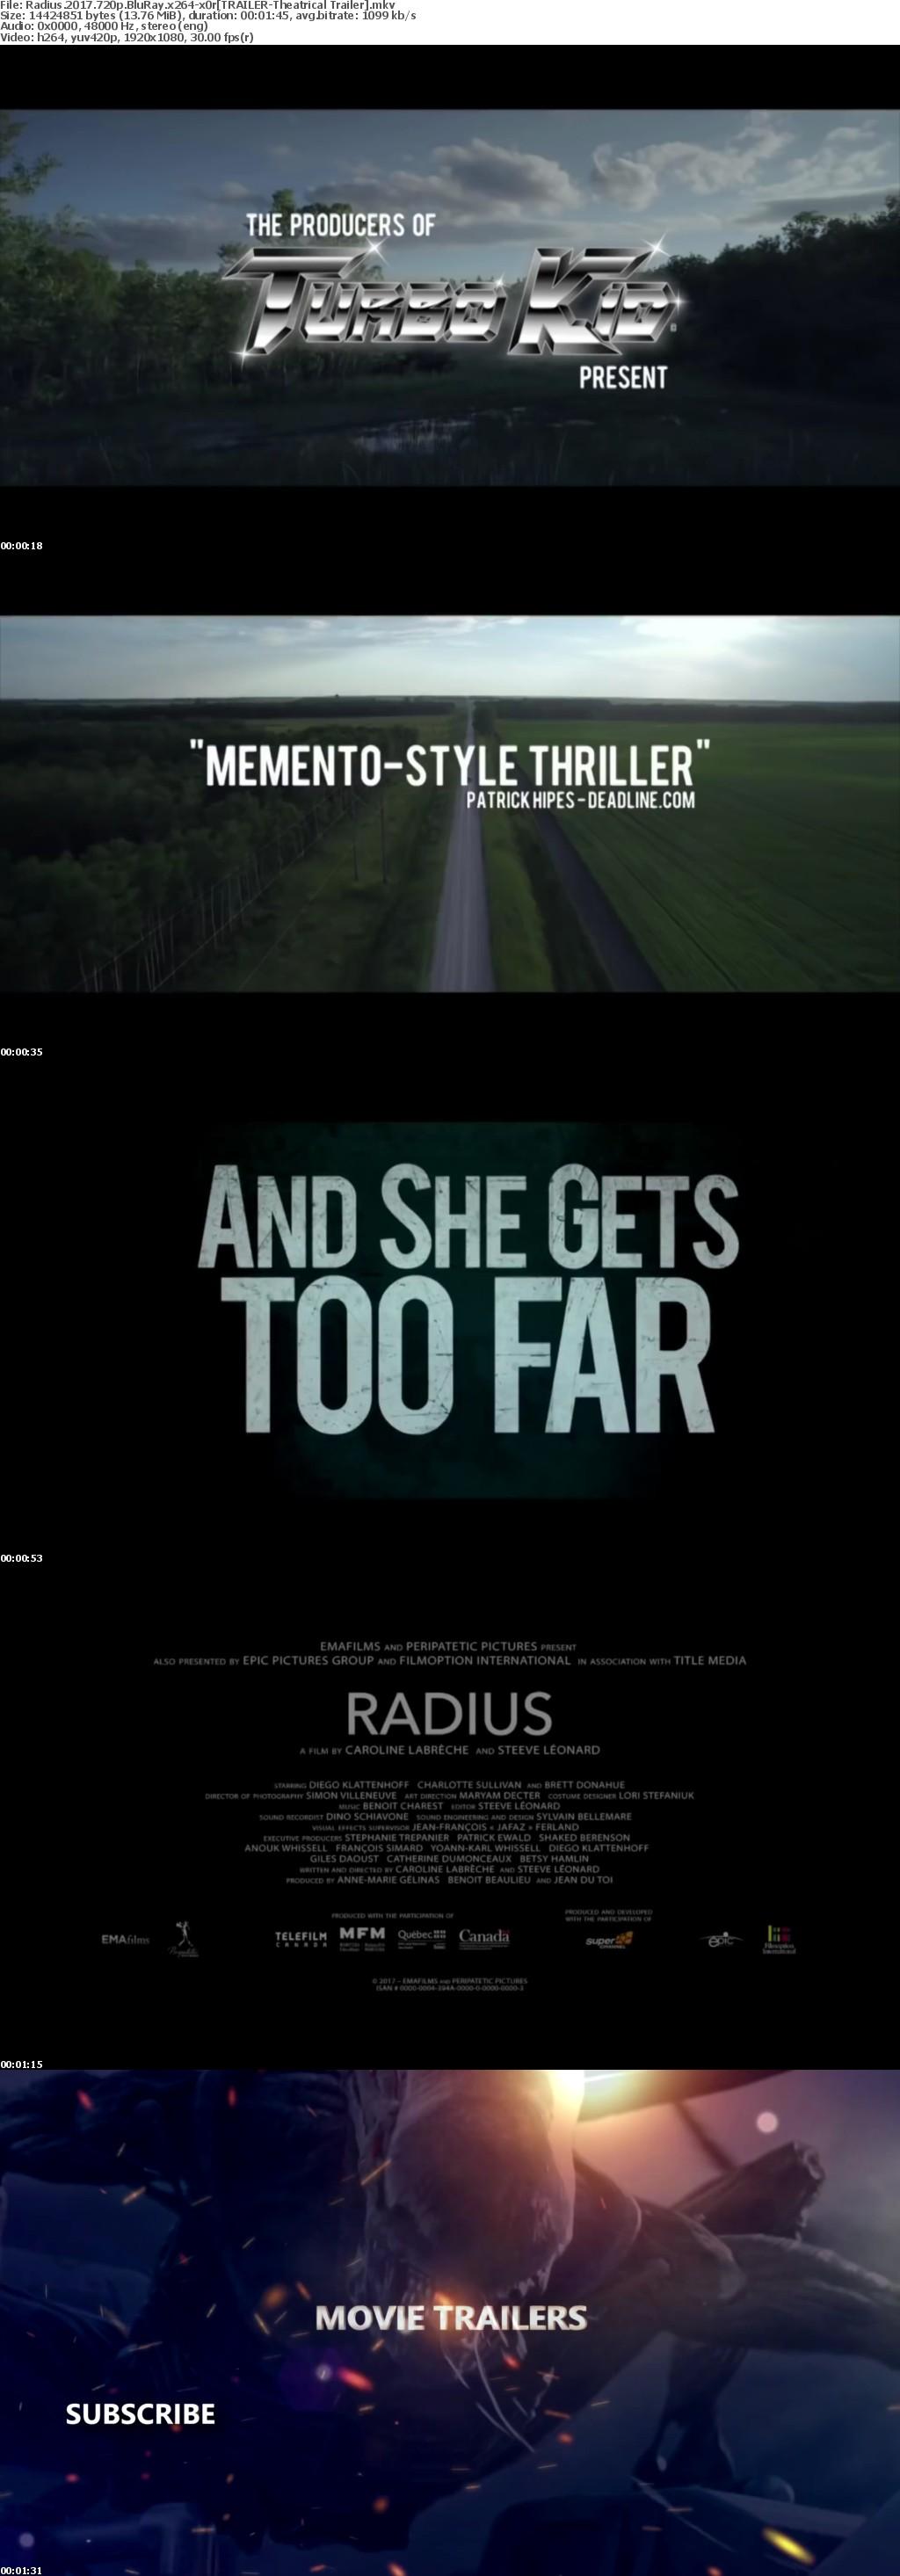 Radius 2017 720p BluRay x264-x0r